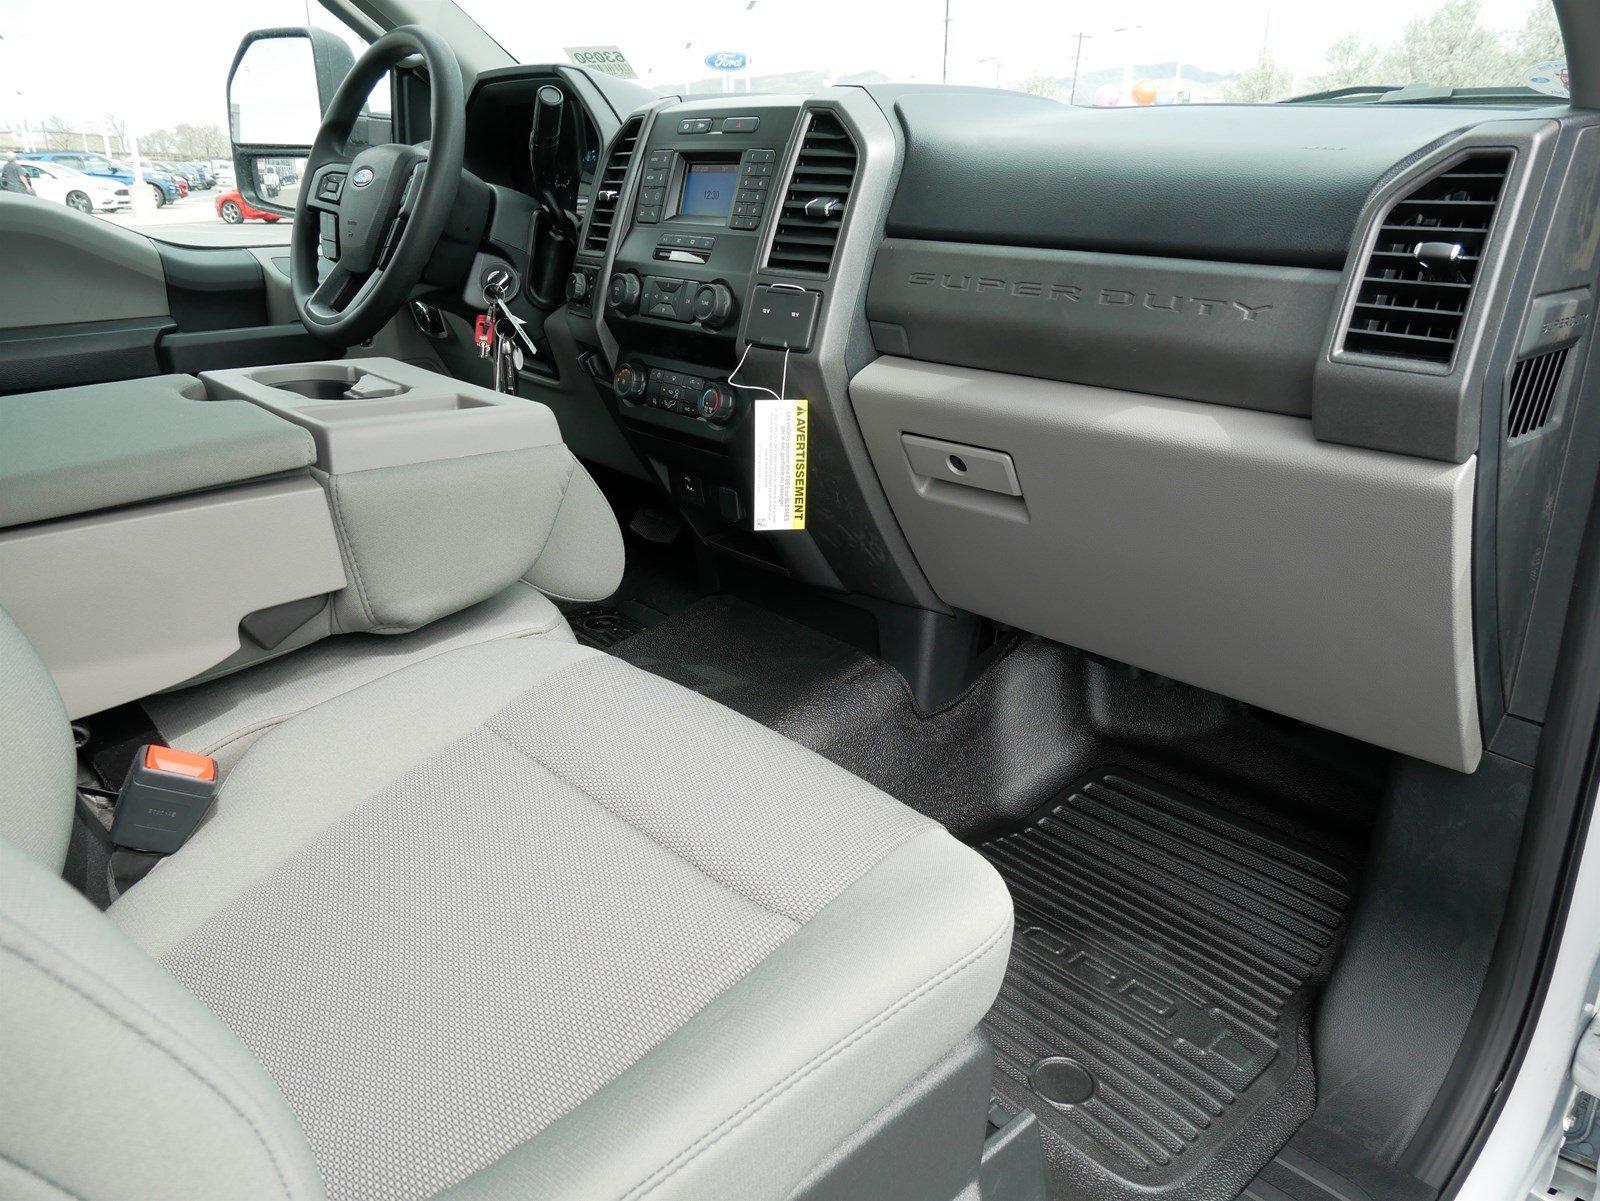 2020 F-550 Regular Cab DRW 4x4, Scelzi CTFB Contractor Body #63090 - photo 31